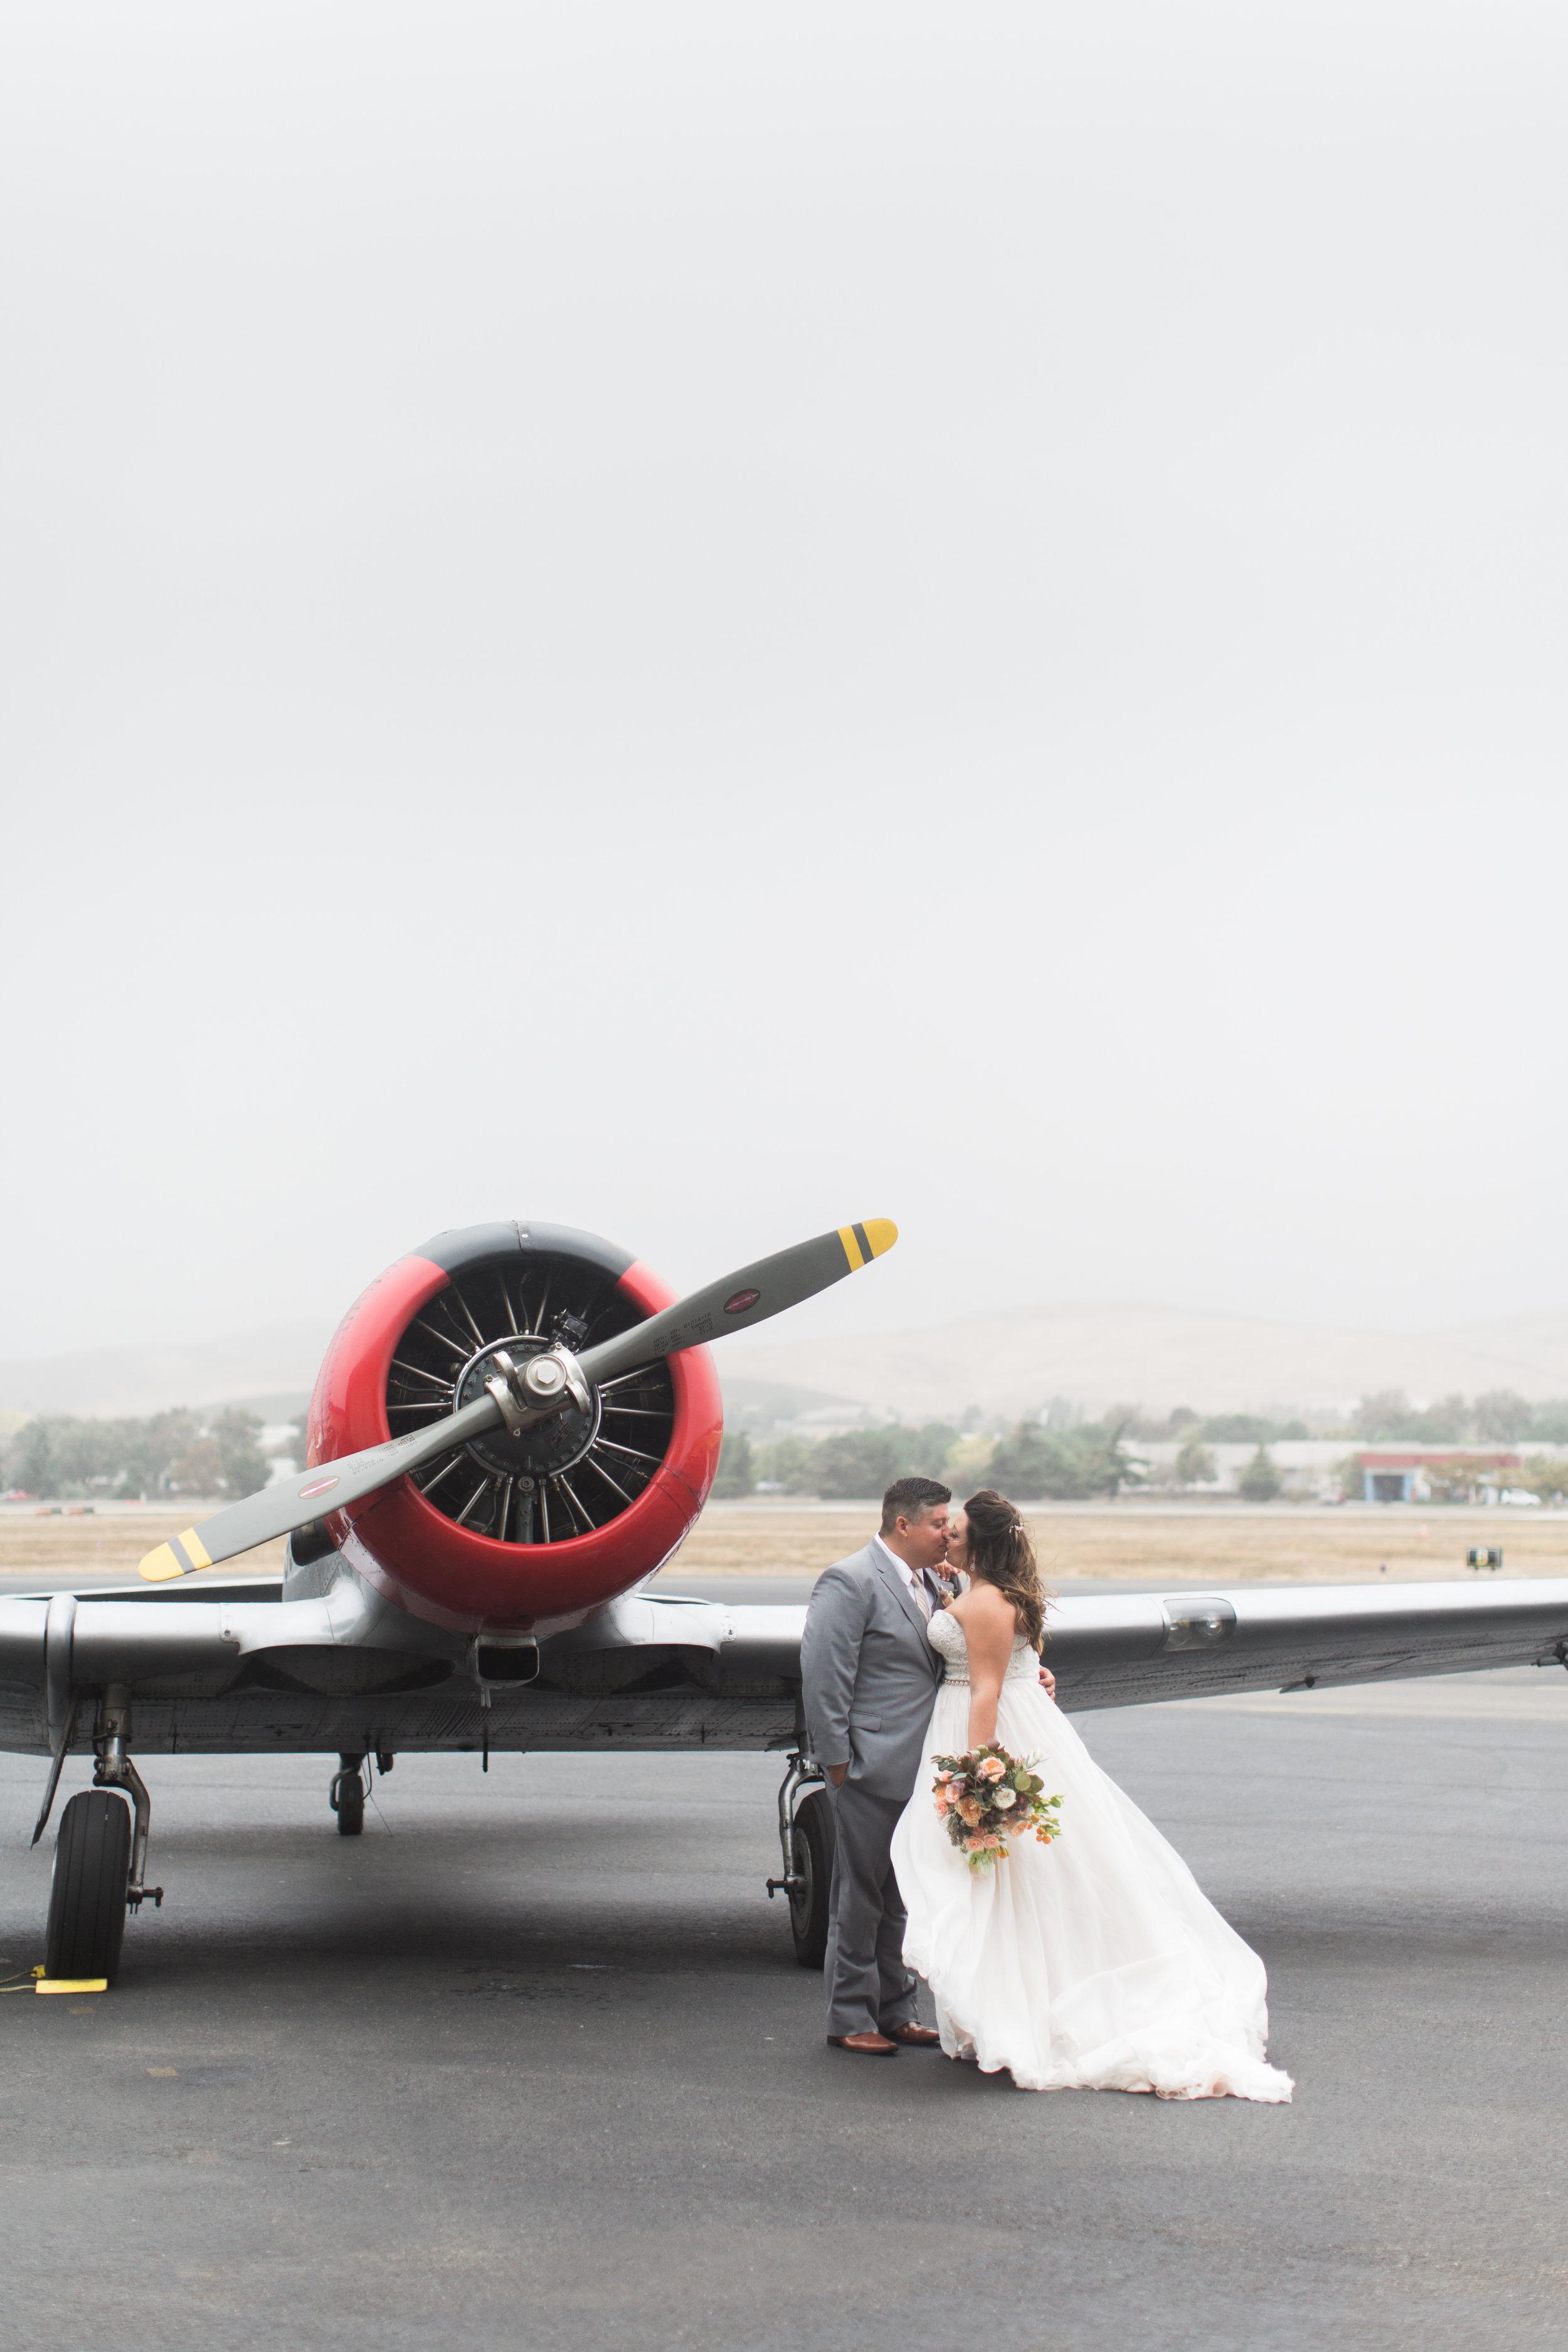 airport-hanger-wedding-at-attitude-aviation-in-livermore-79.jpg